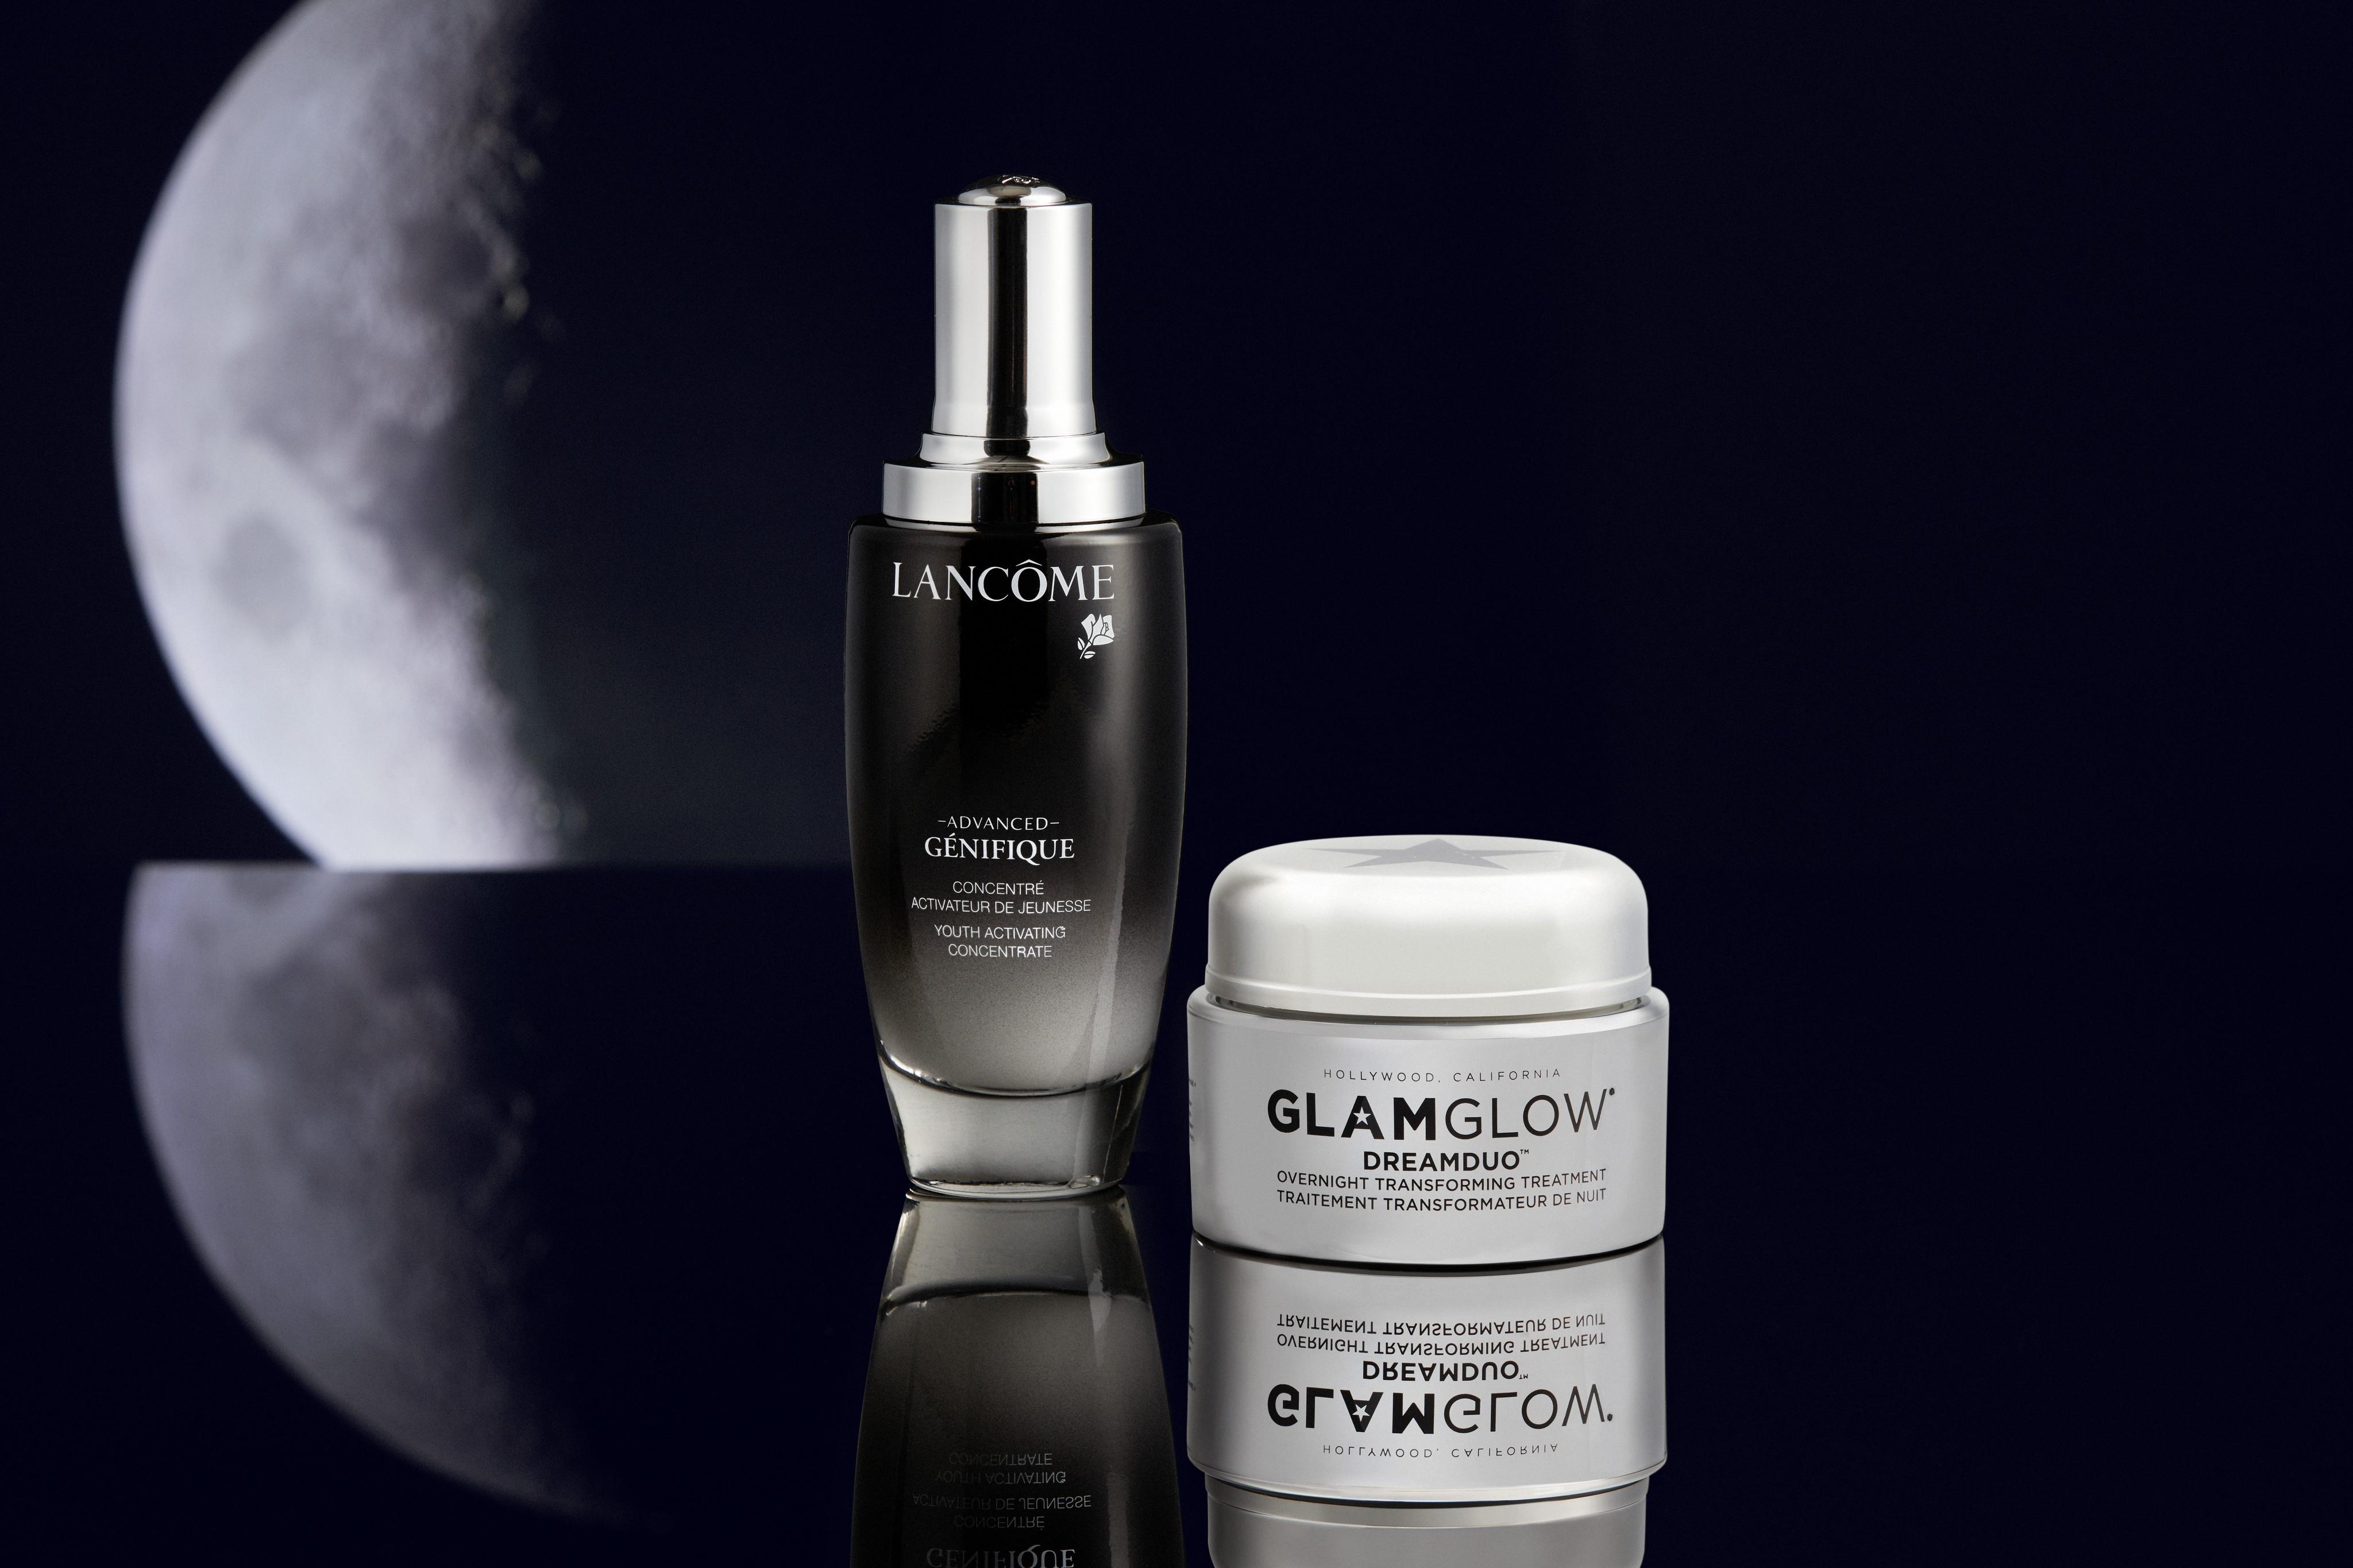 Skincare-product-beauty-sleep-cloud-heaven-moon-night-1-unlimited-Web-Rendition